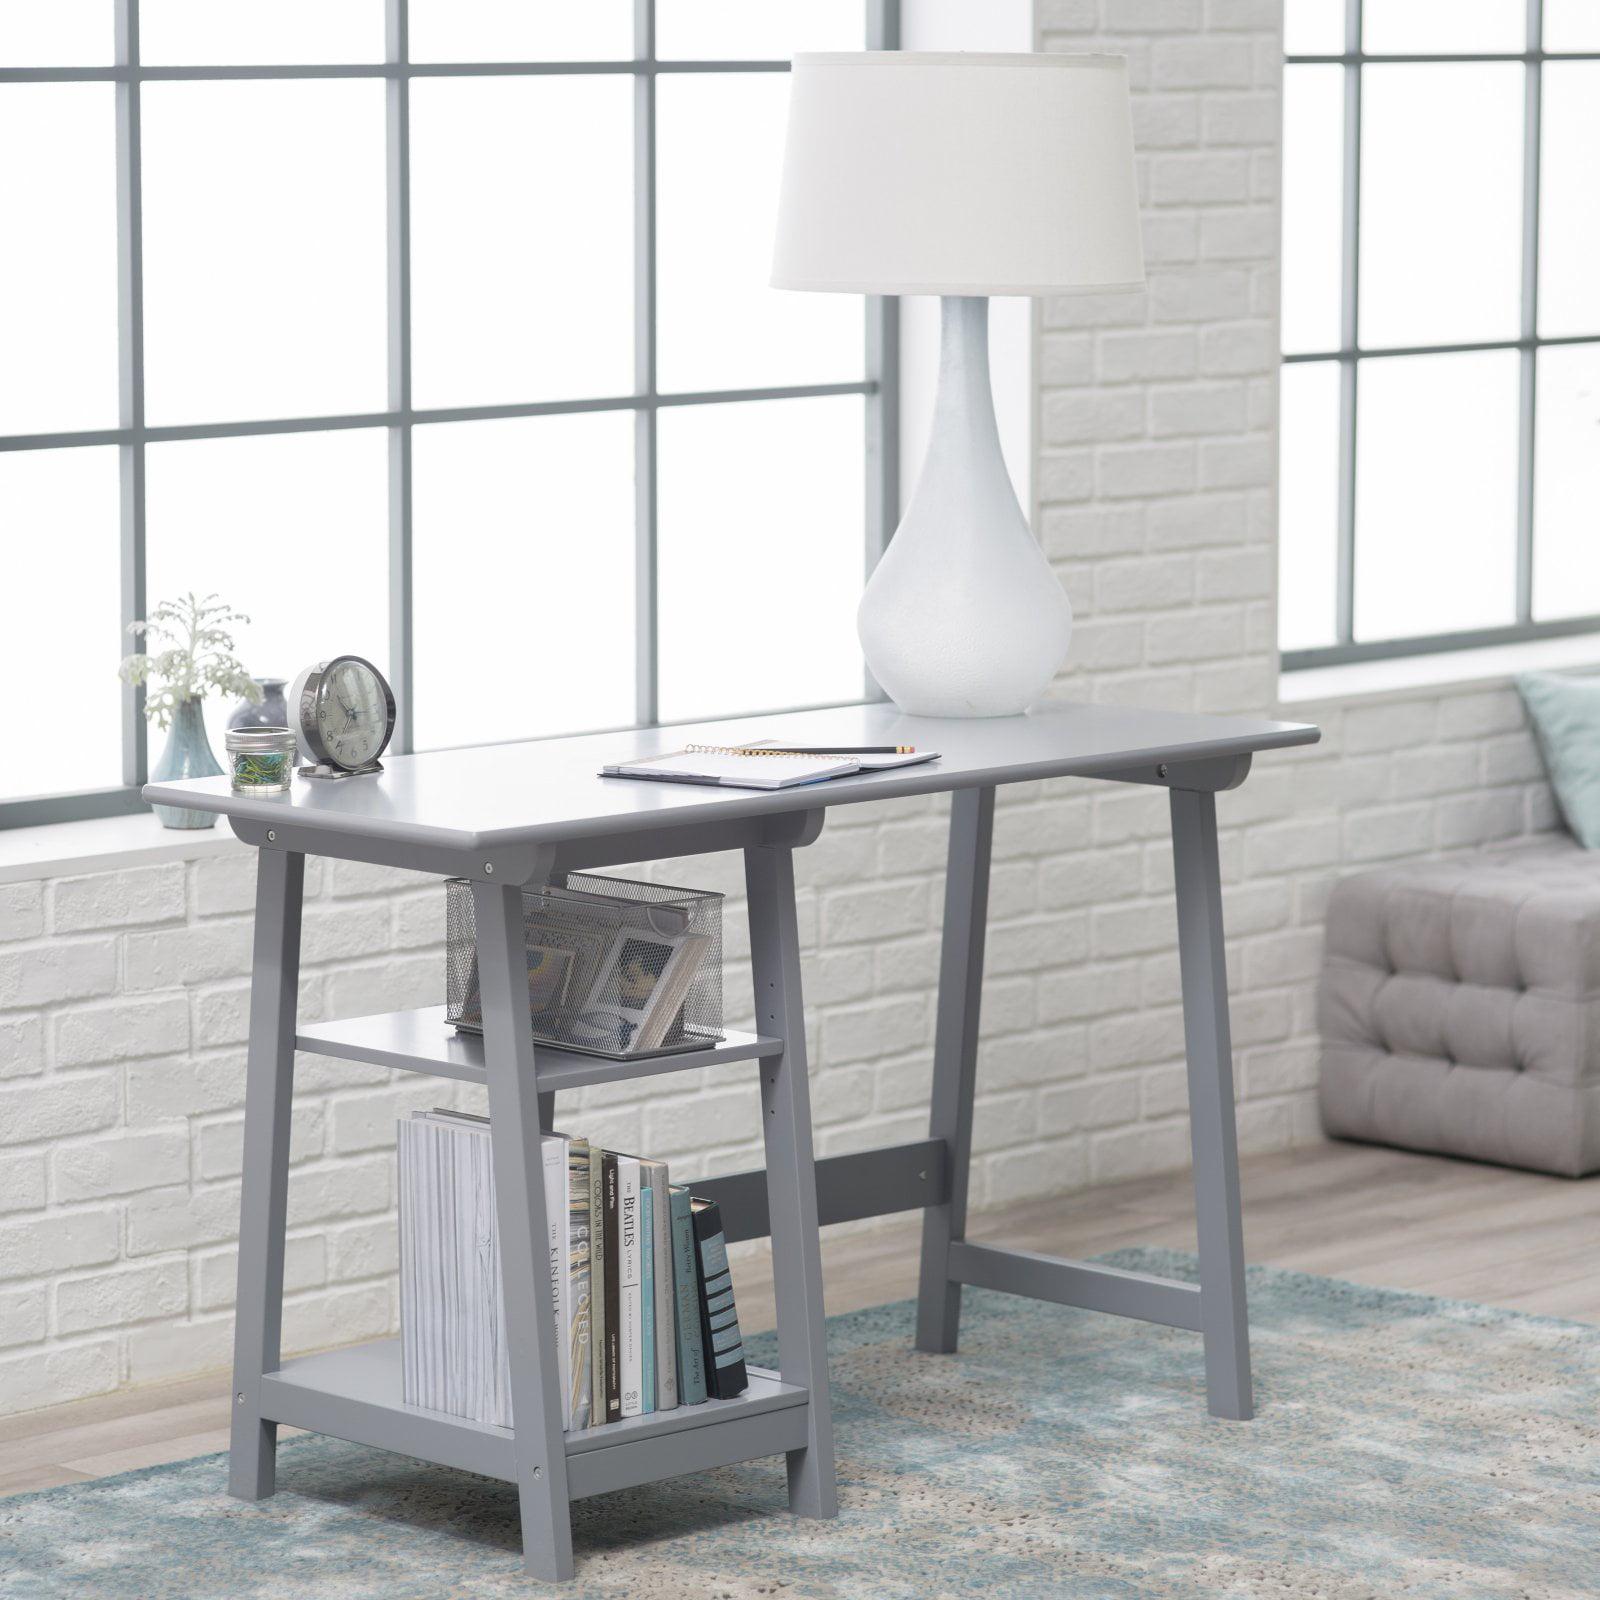 Manhattan Open Computer Desk with Adjustable Shelf - Gray